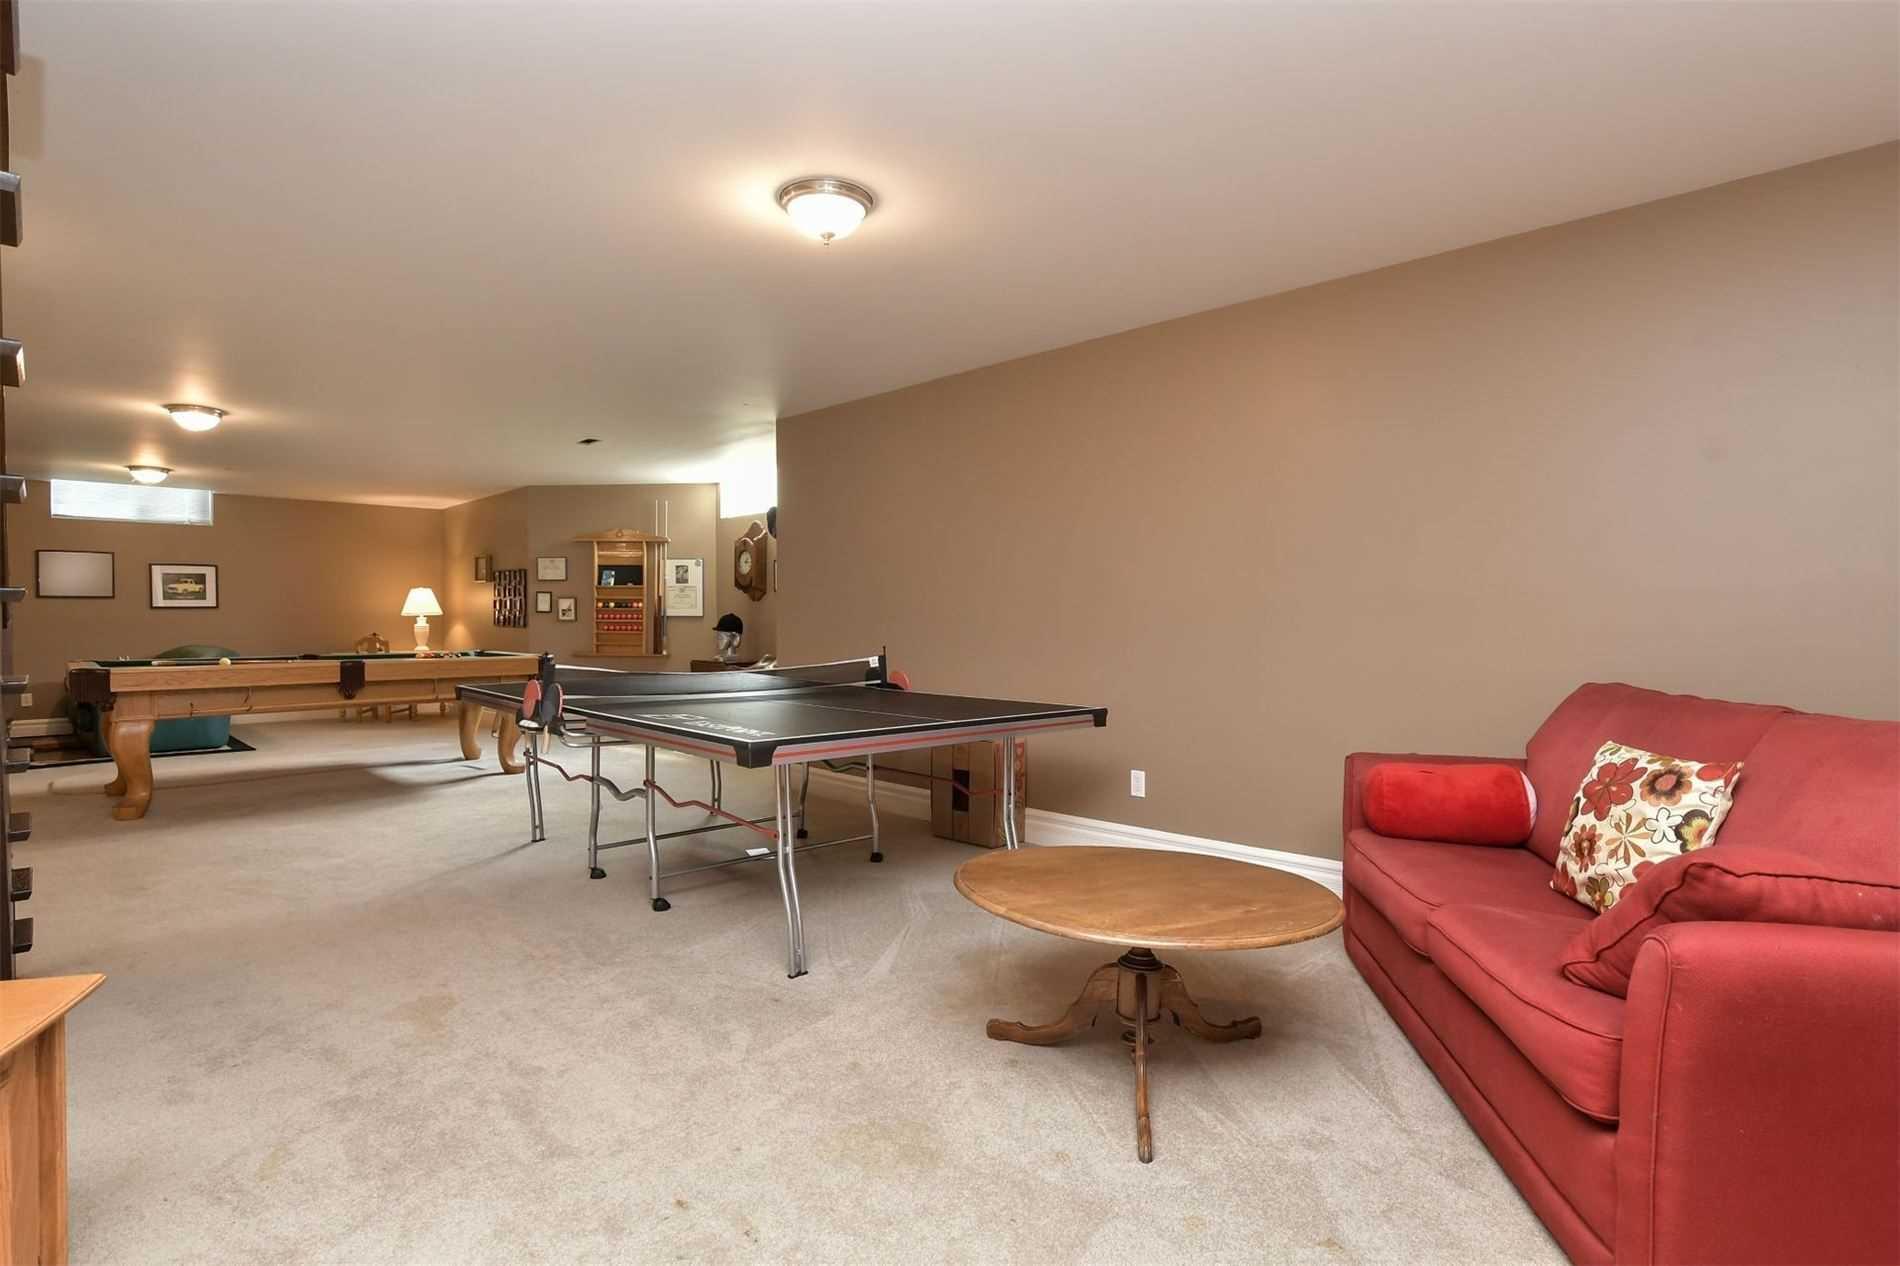 Detached house For Sale In Melancthon - 21 Oldfield Crt, Melancthon, Ontario, Canada L9V 3G7 , 3 Bedrooms Bedrooms, ,3 BathroomsBathrooms,Detached,For Sale,Oldfield